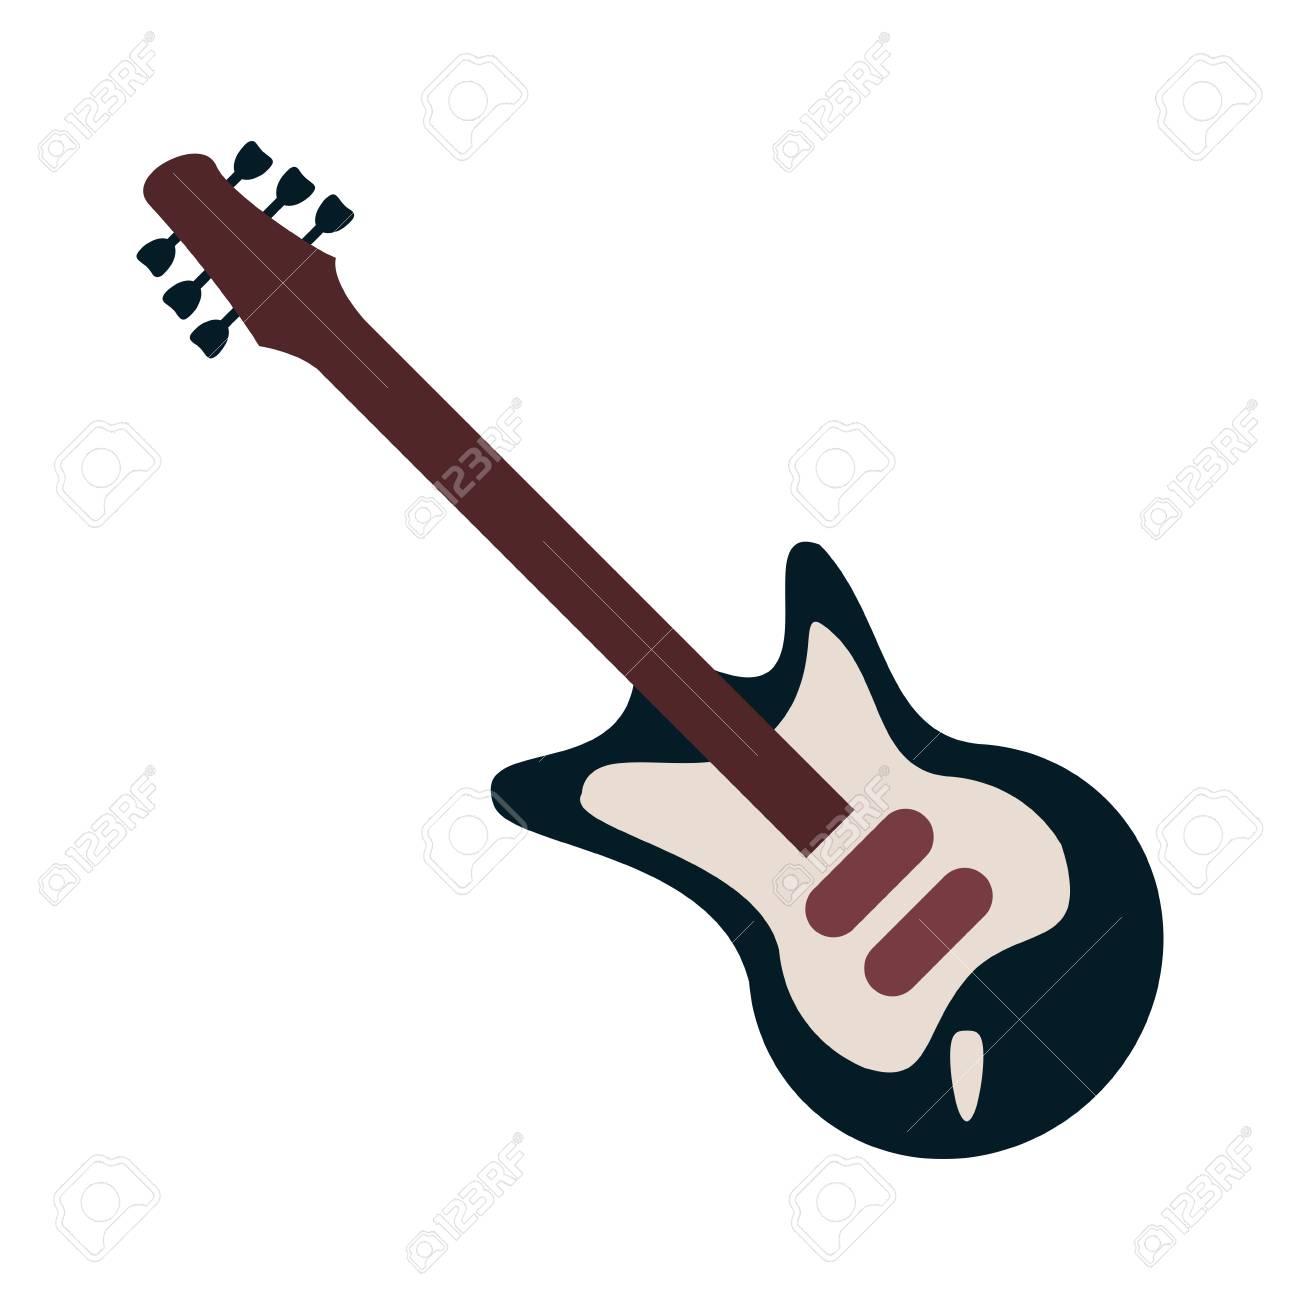 electric guitar instrument icon vector illustration graphic design rh 123rf com  guitar vectoriel